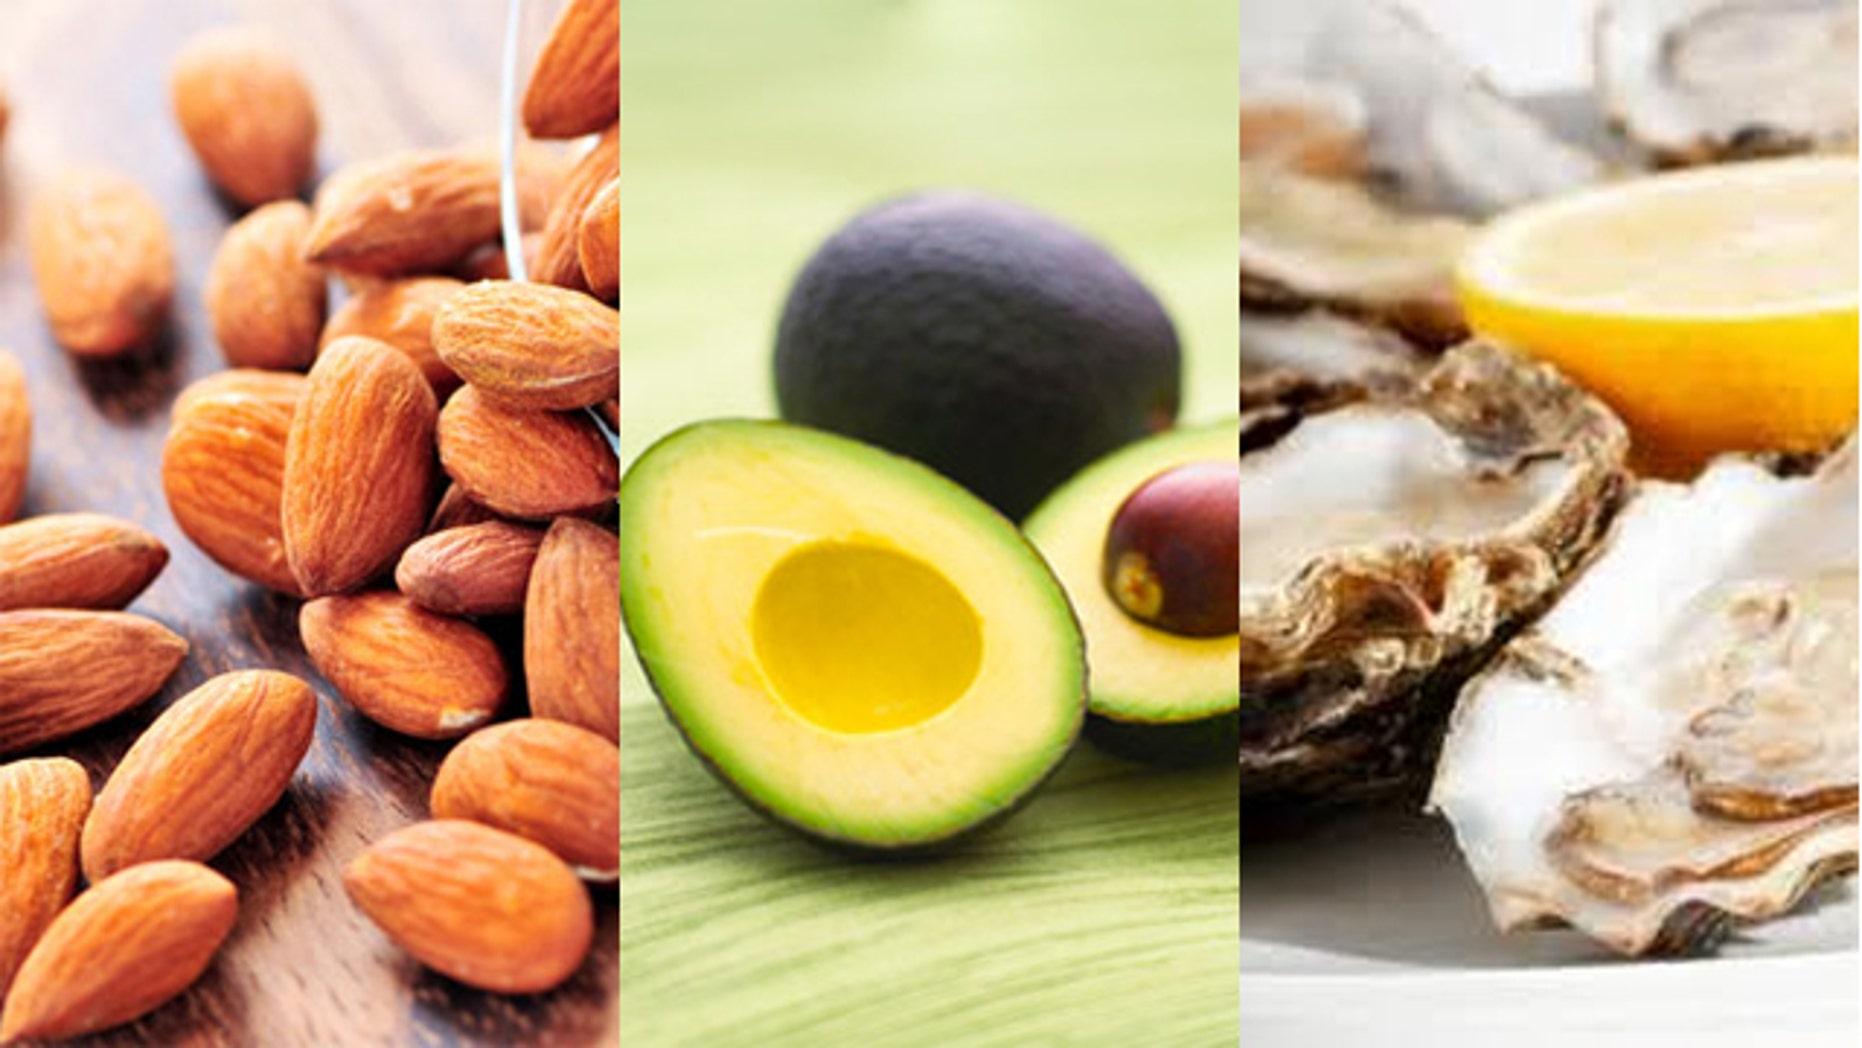 What fruits are aphrodisiacs